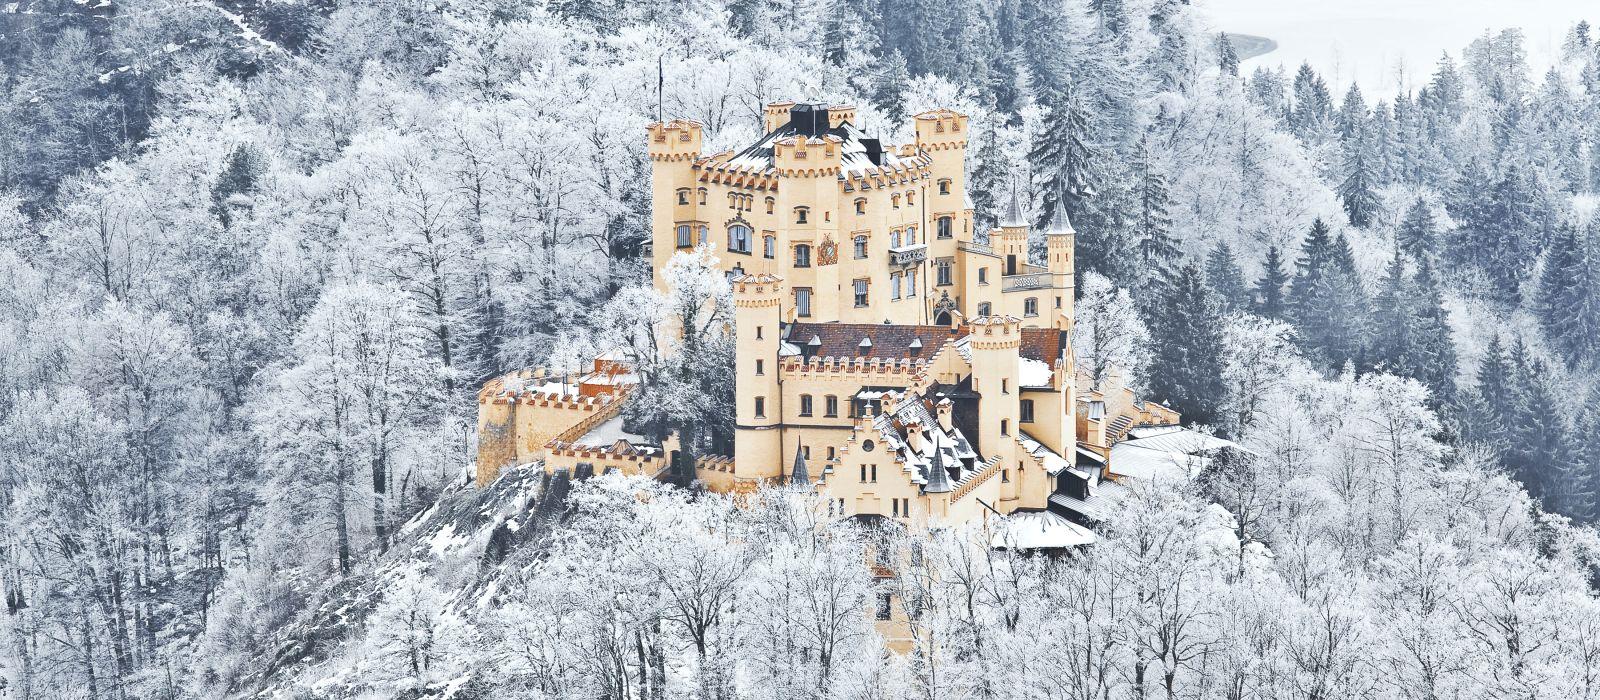 The castle of Hohenschwangau in Germany, Bavaria, Europe